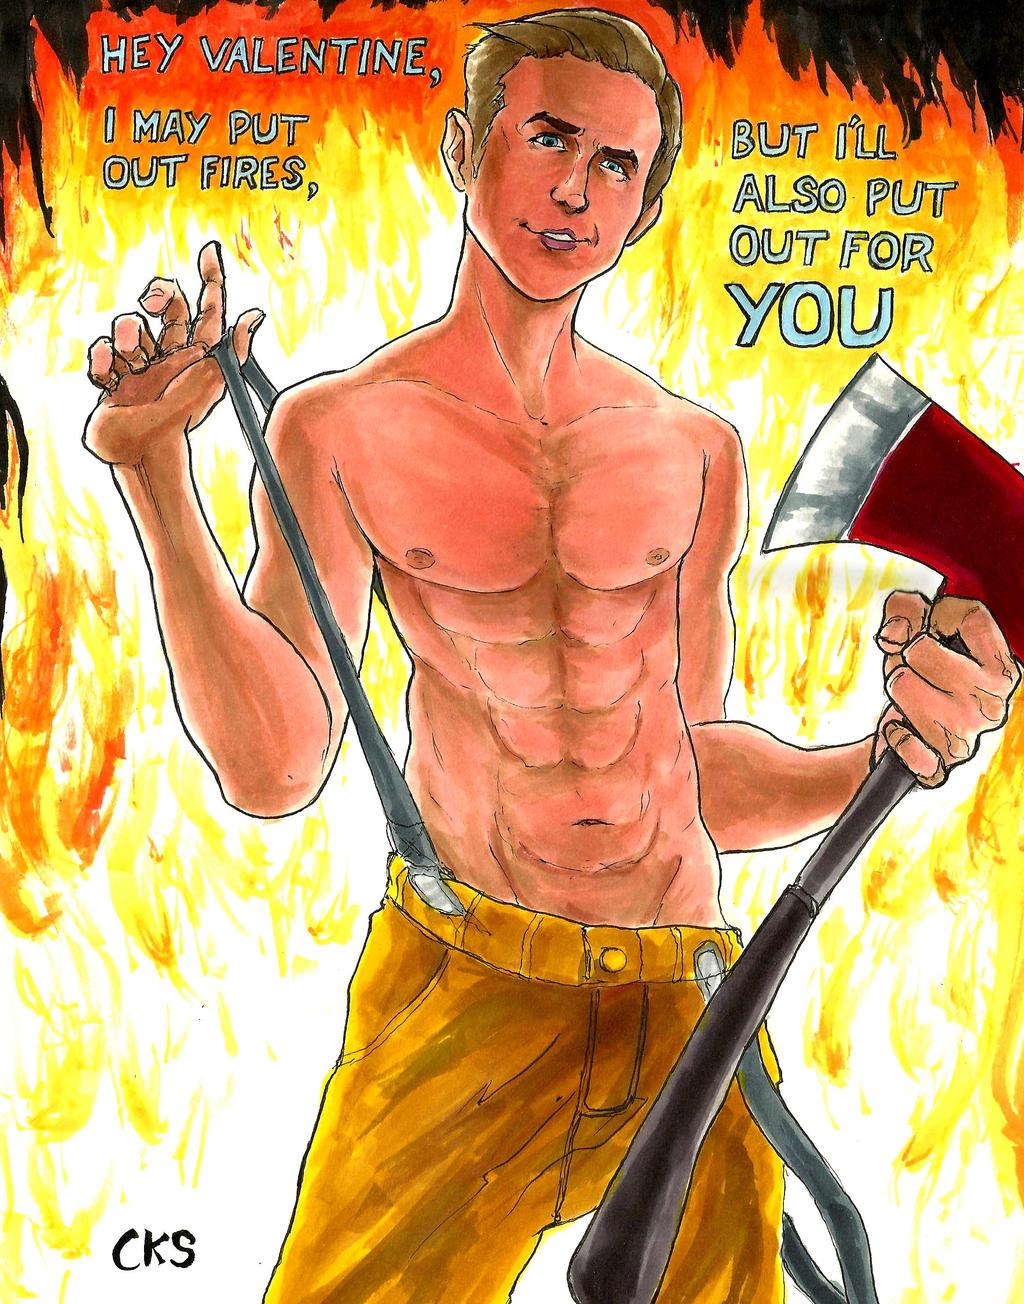 Valentine's Day Sexy Fireman Ryan Gosling by Scoogle on DeviantArt